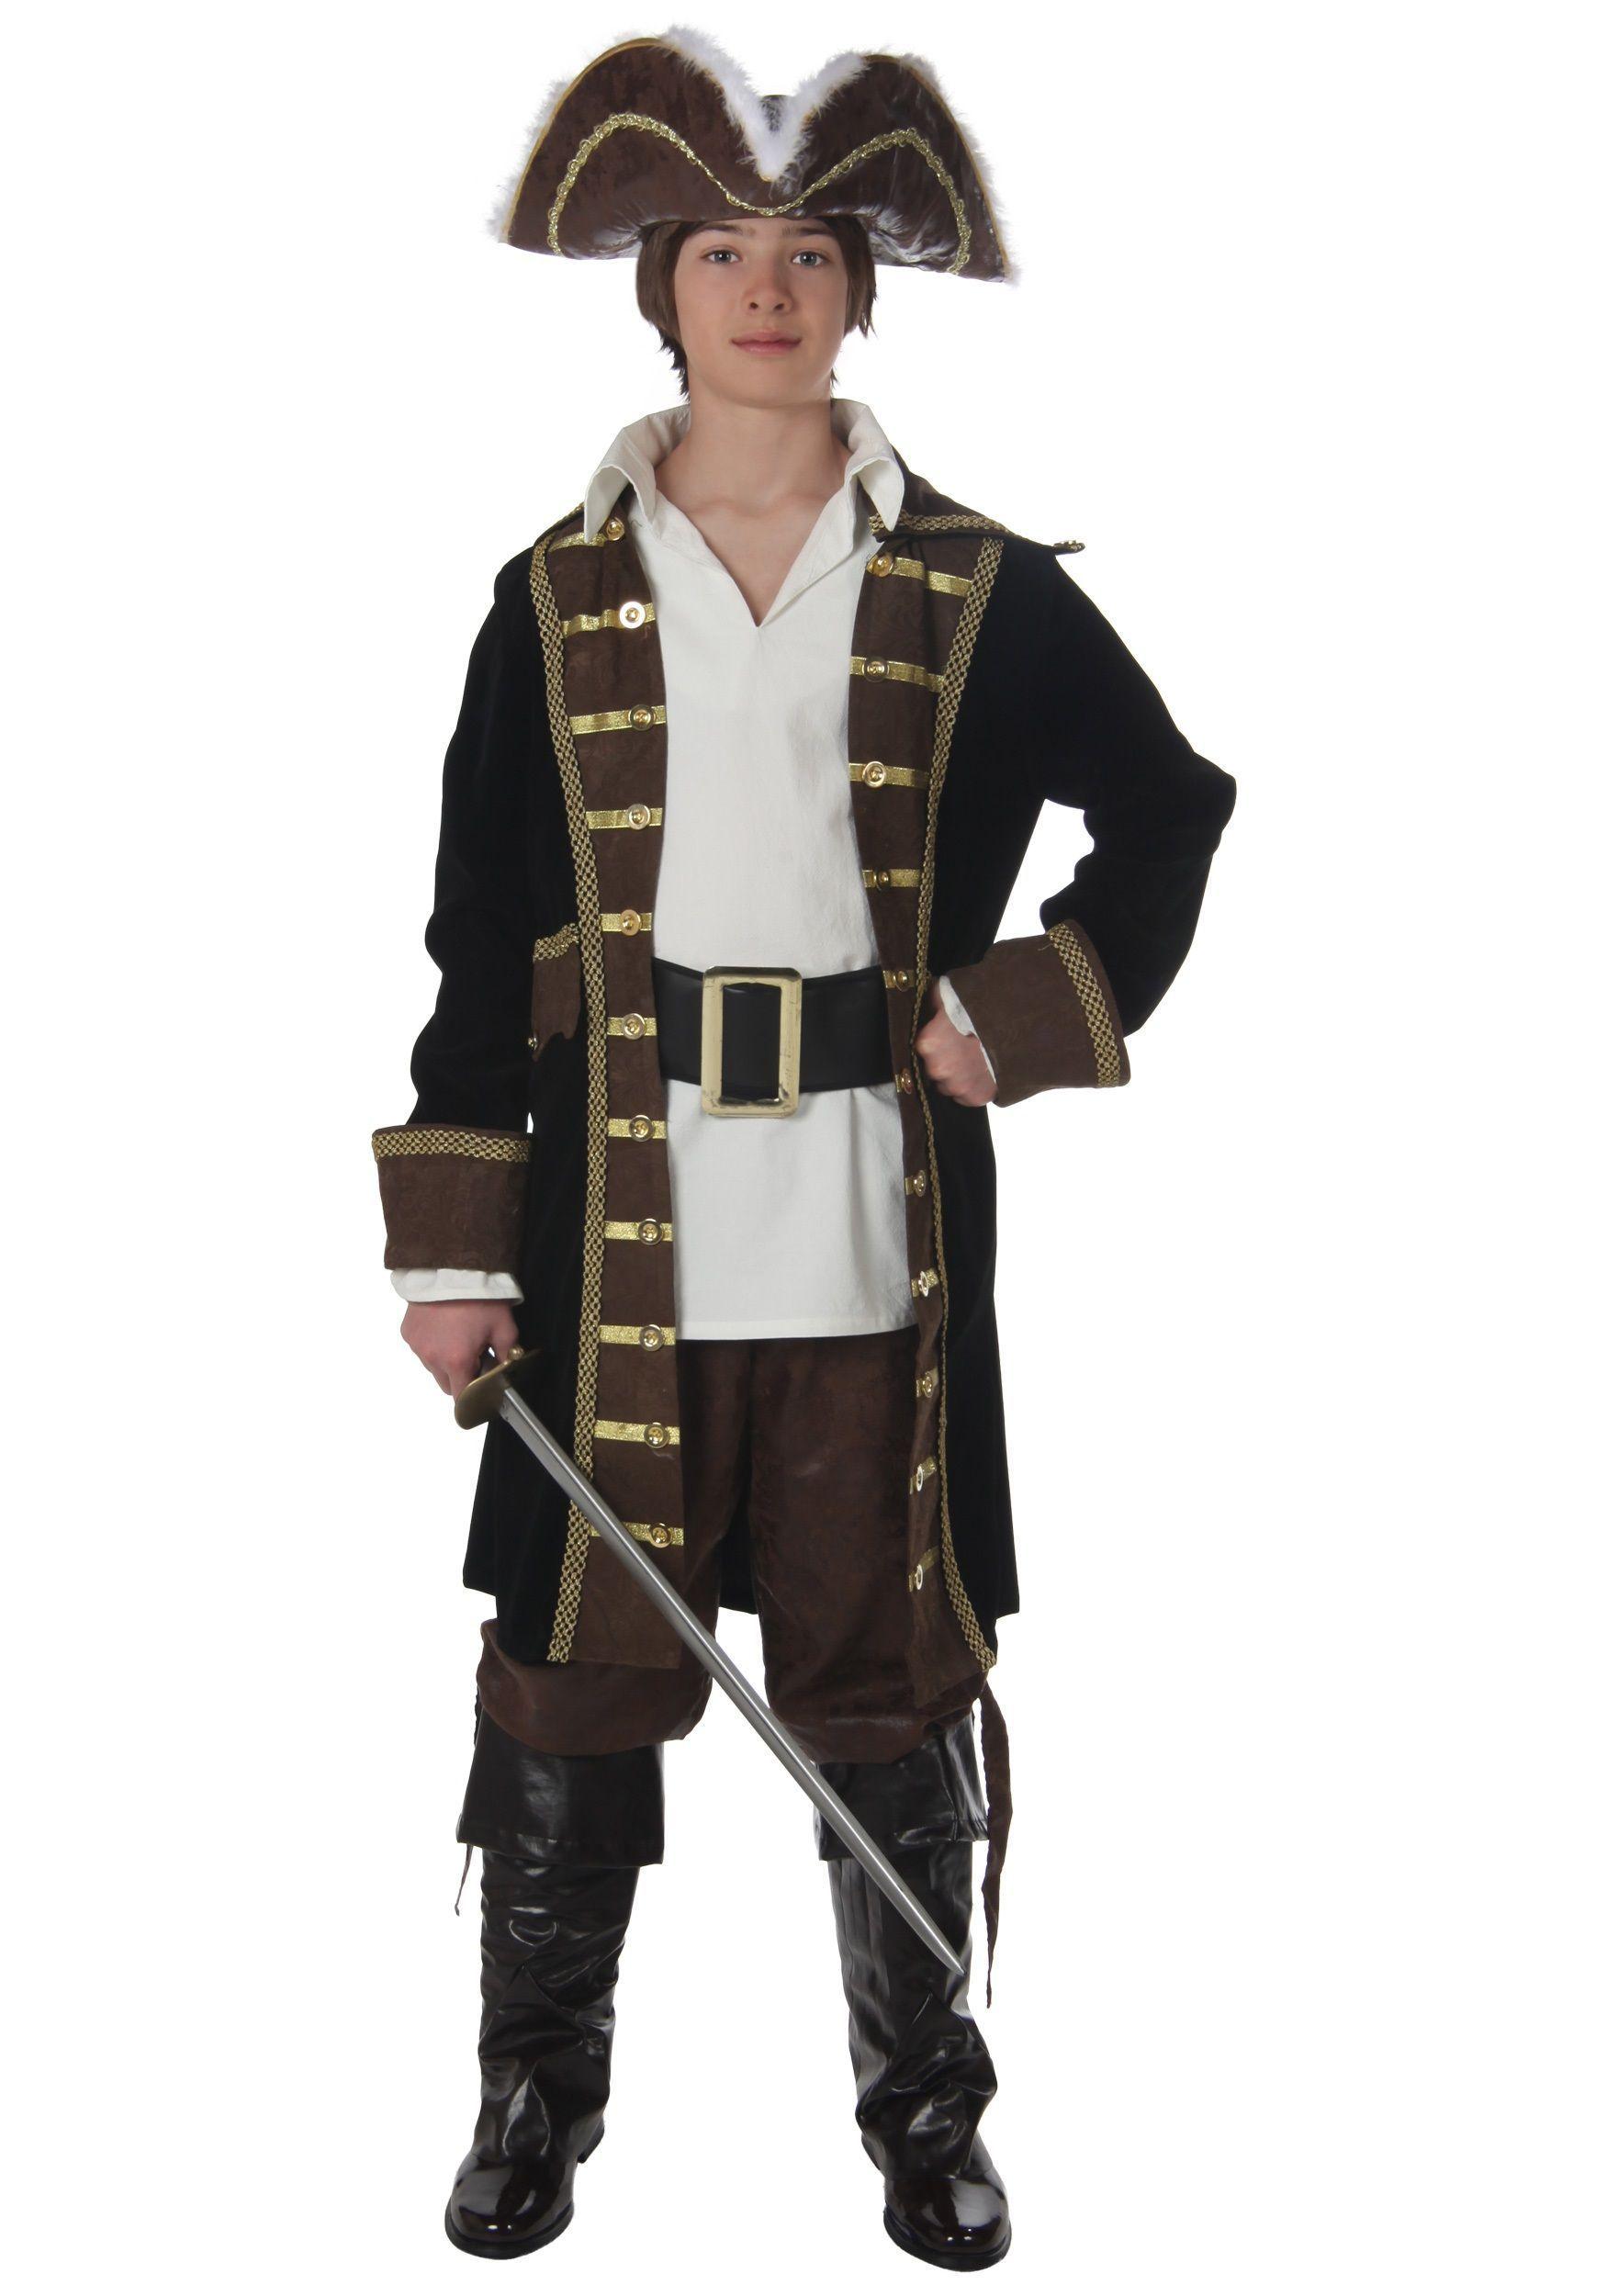 sixteenth century pirate costumes - Google Search #diypiratecostumeforkids sixteenth century pirate costumes - Google Search #diypiratecostumeforkids sixteenth century pirate costumes - Google Search #diypiratecostumeforkids sixteenth century pirate costumes - Google Search #diypiratecostumeforkids